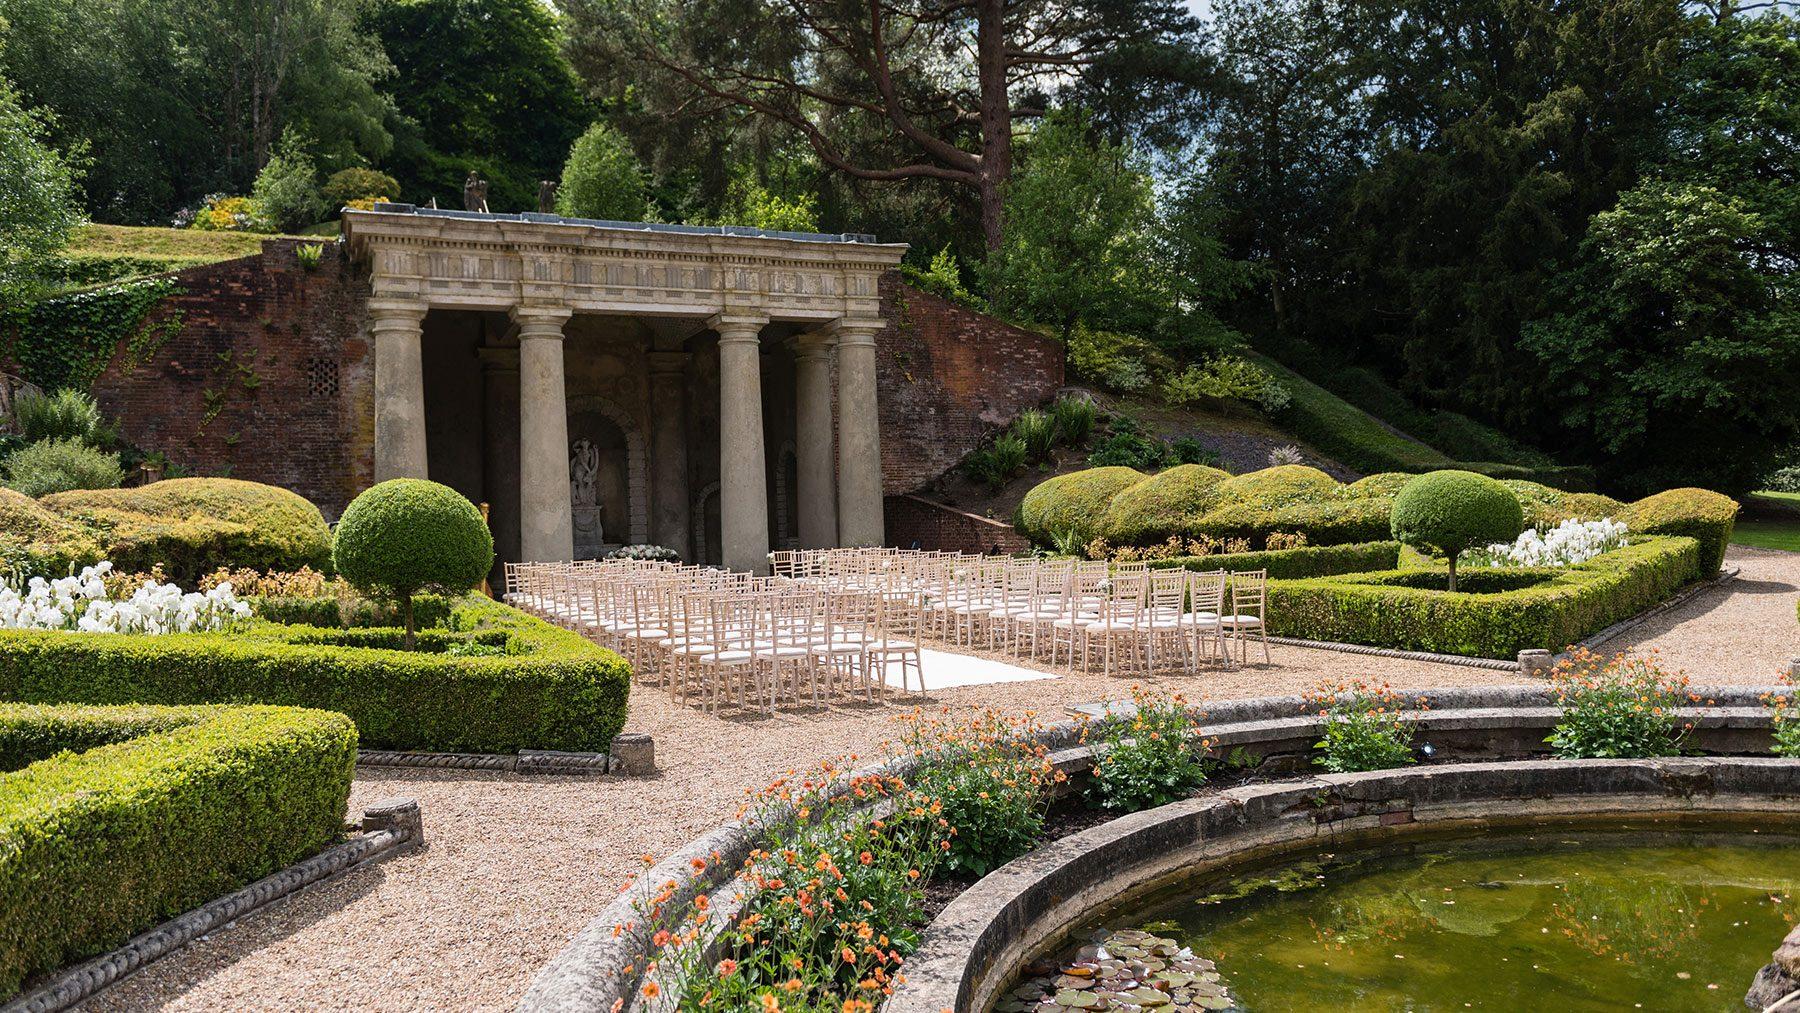 A wedding in summer in the Italian Gardens